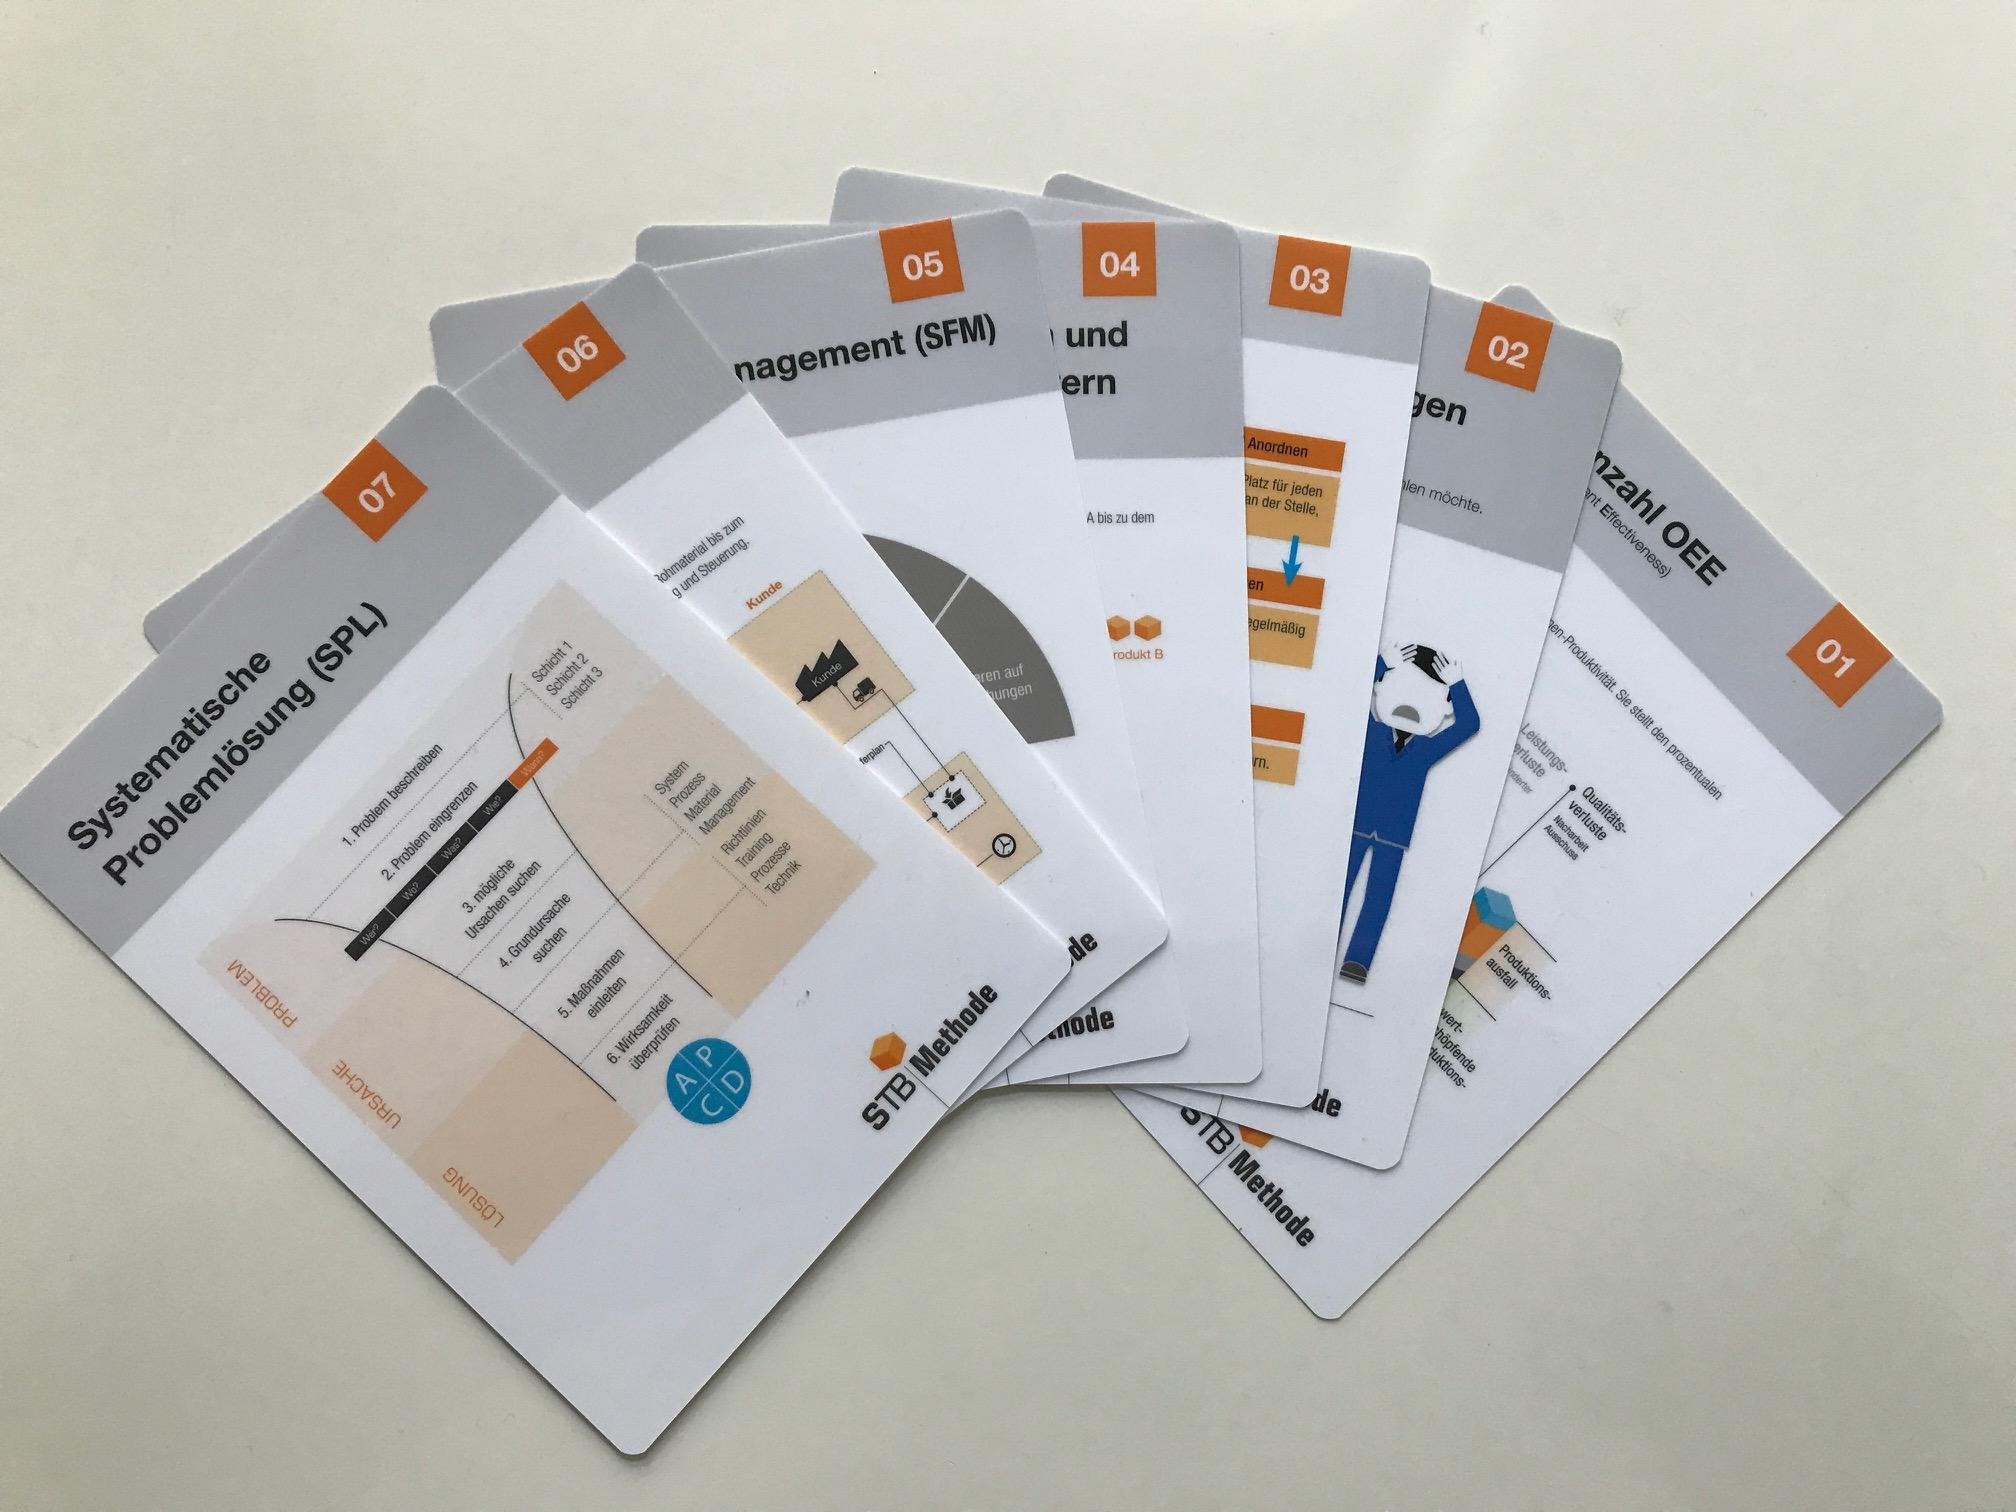 Pocket Guide: Packet